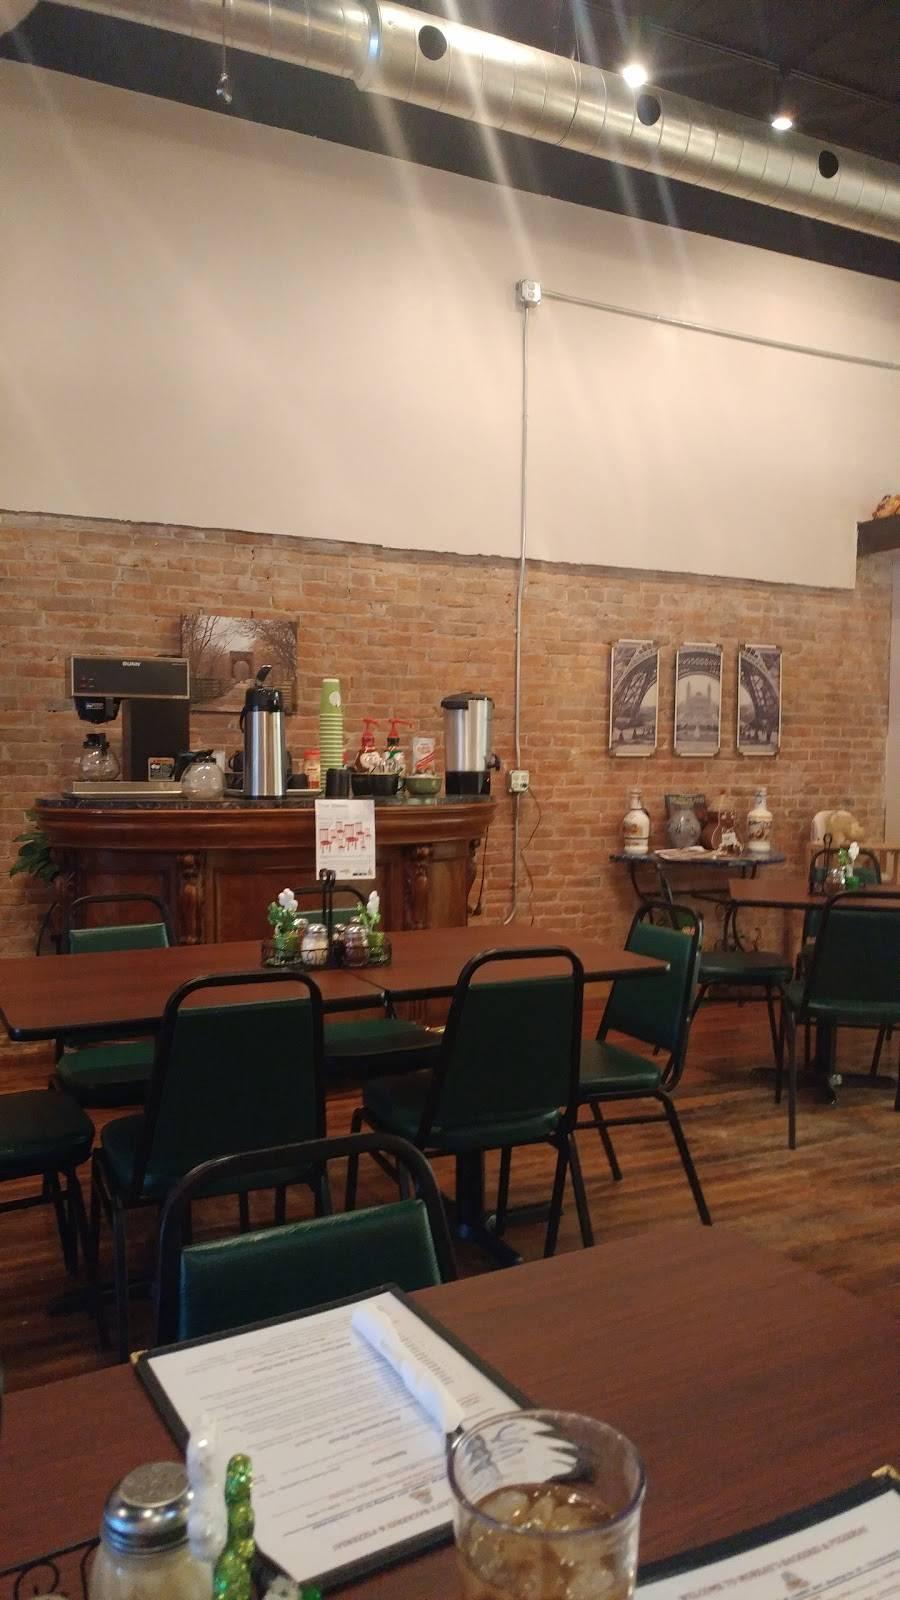 Moreaus Bäckerei & Pizzeria | bakery | 407 Main St, Malvern, IA 51551, USA | 7126248422 OR +1 712-624-8422